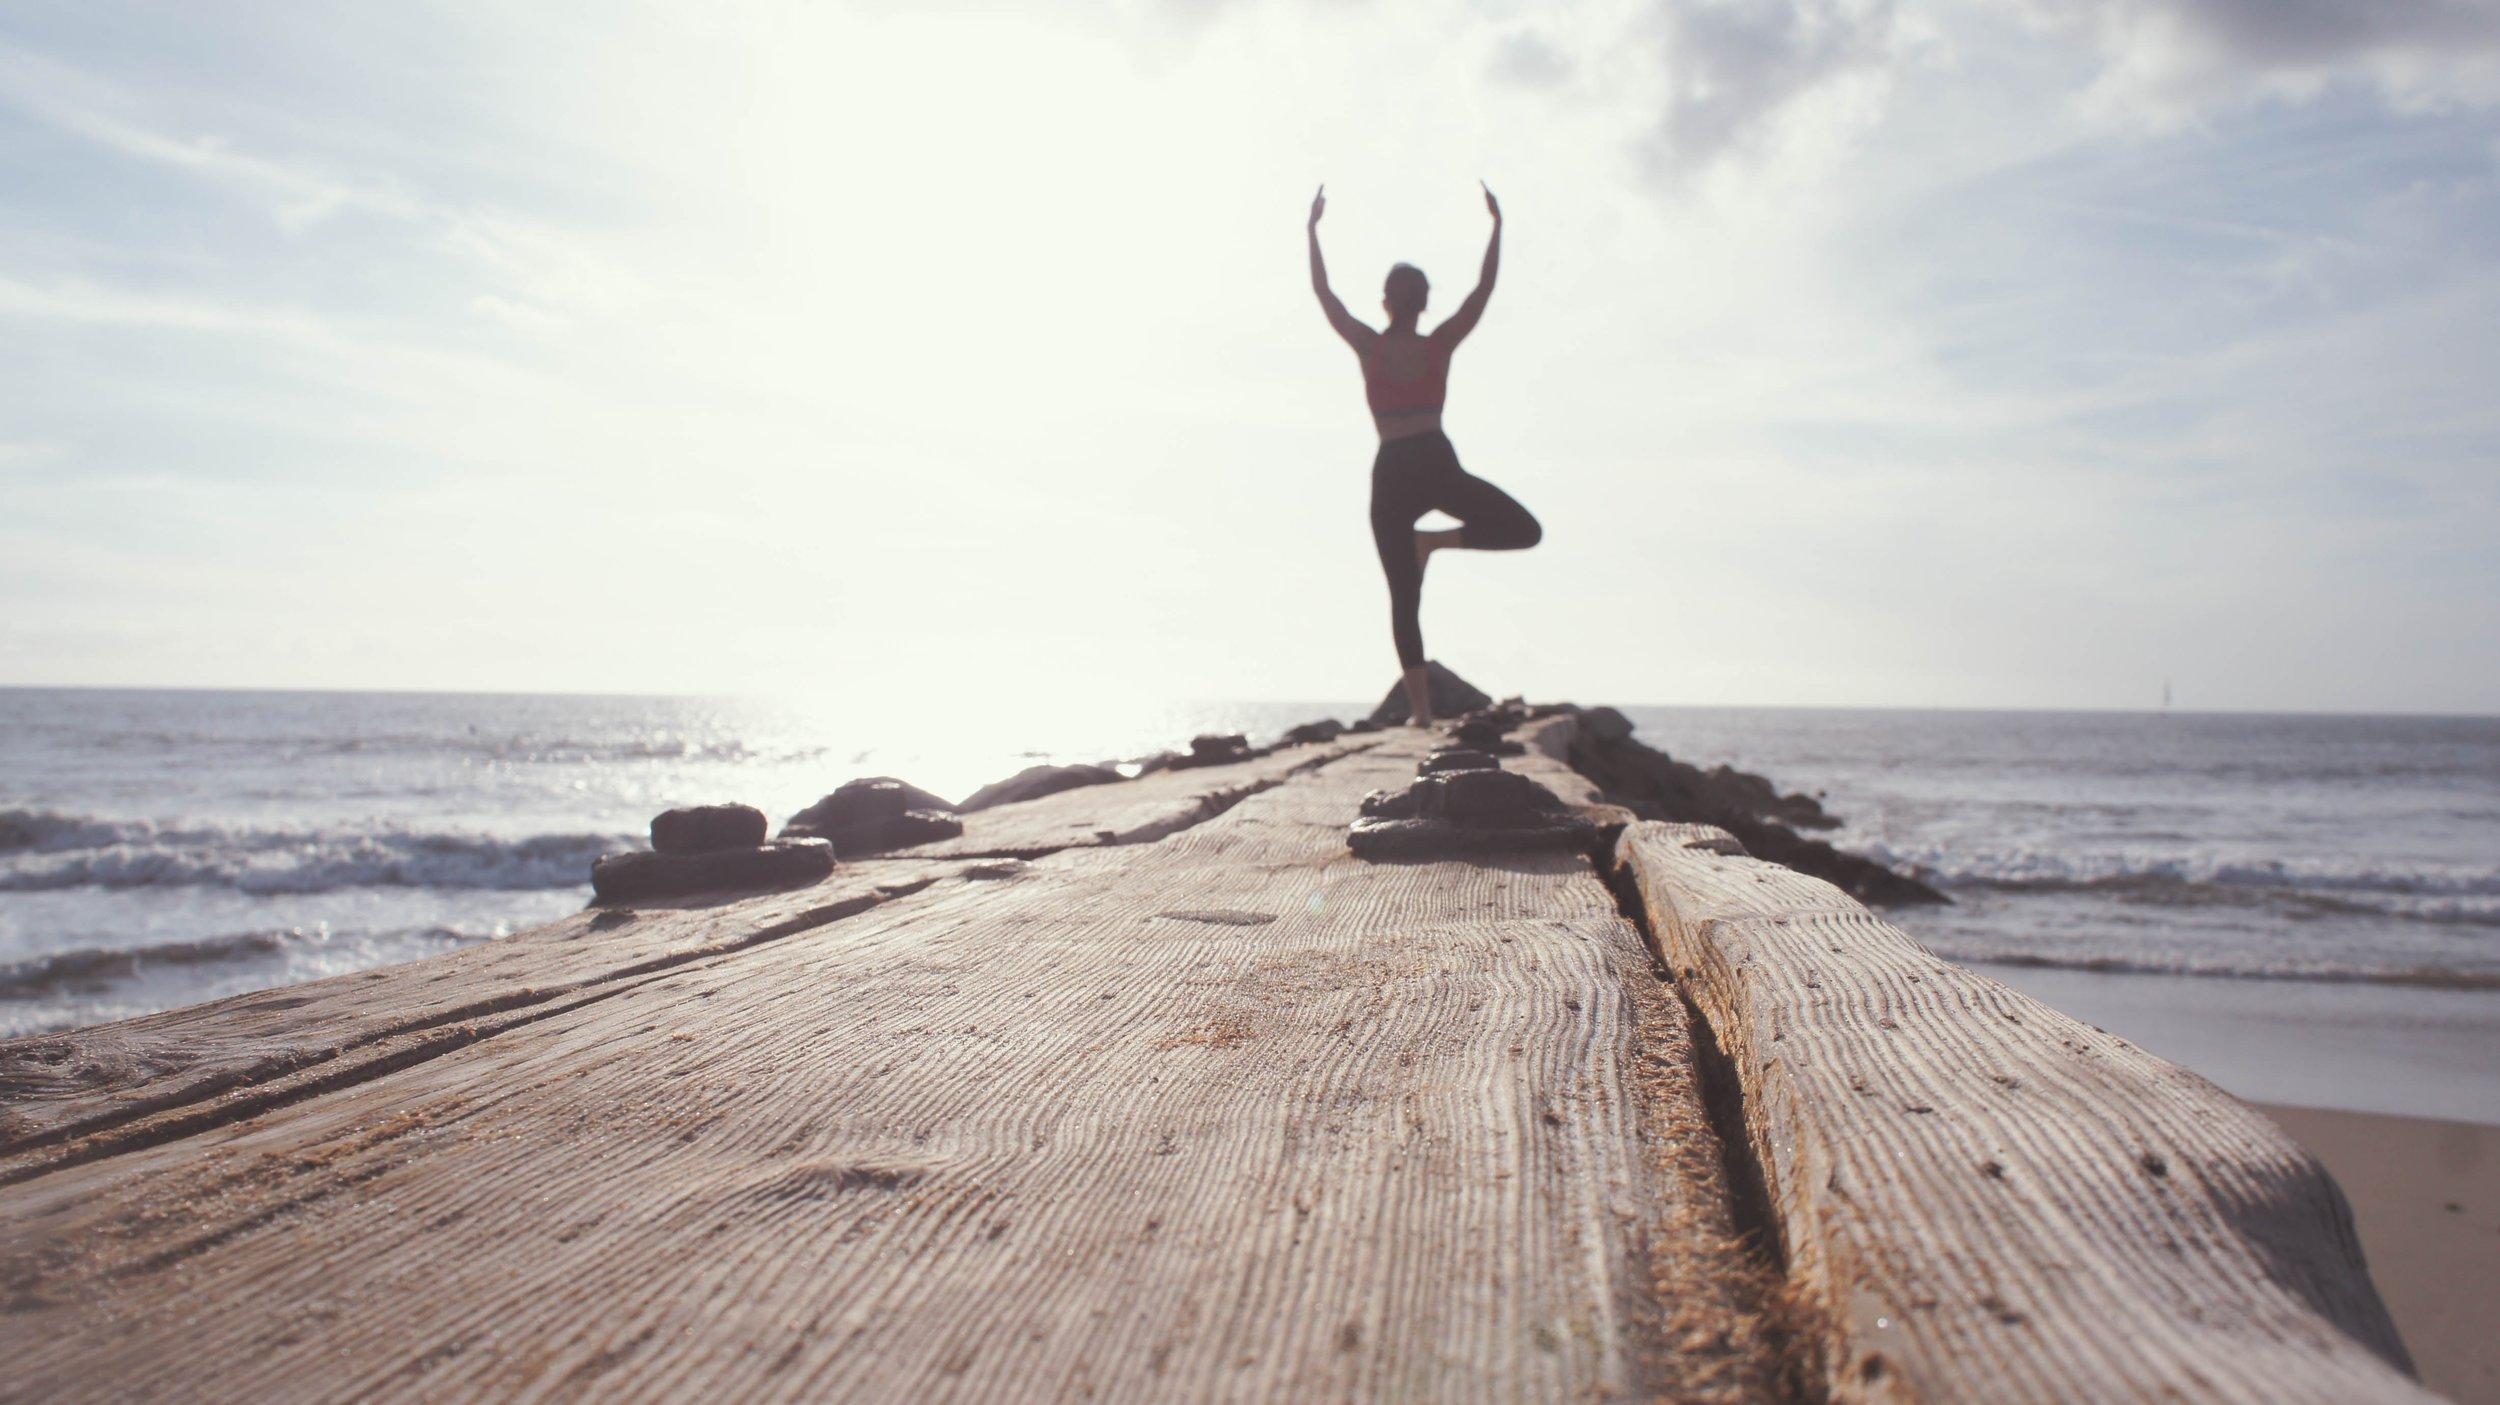 marion-michele-yoga-meditatie-ademhaling